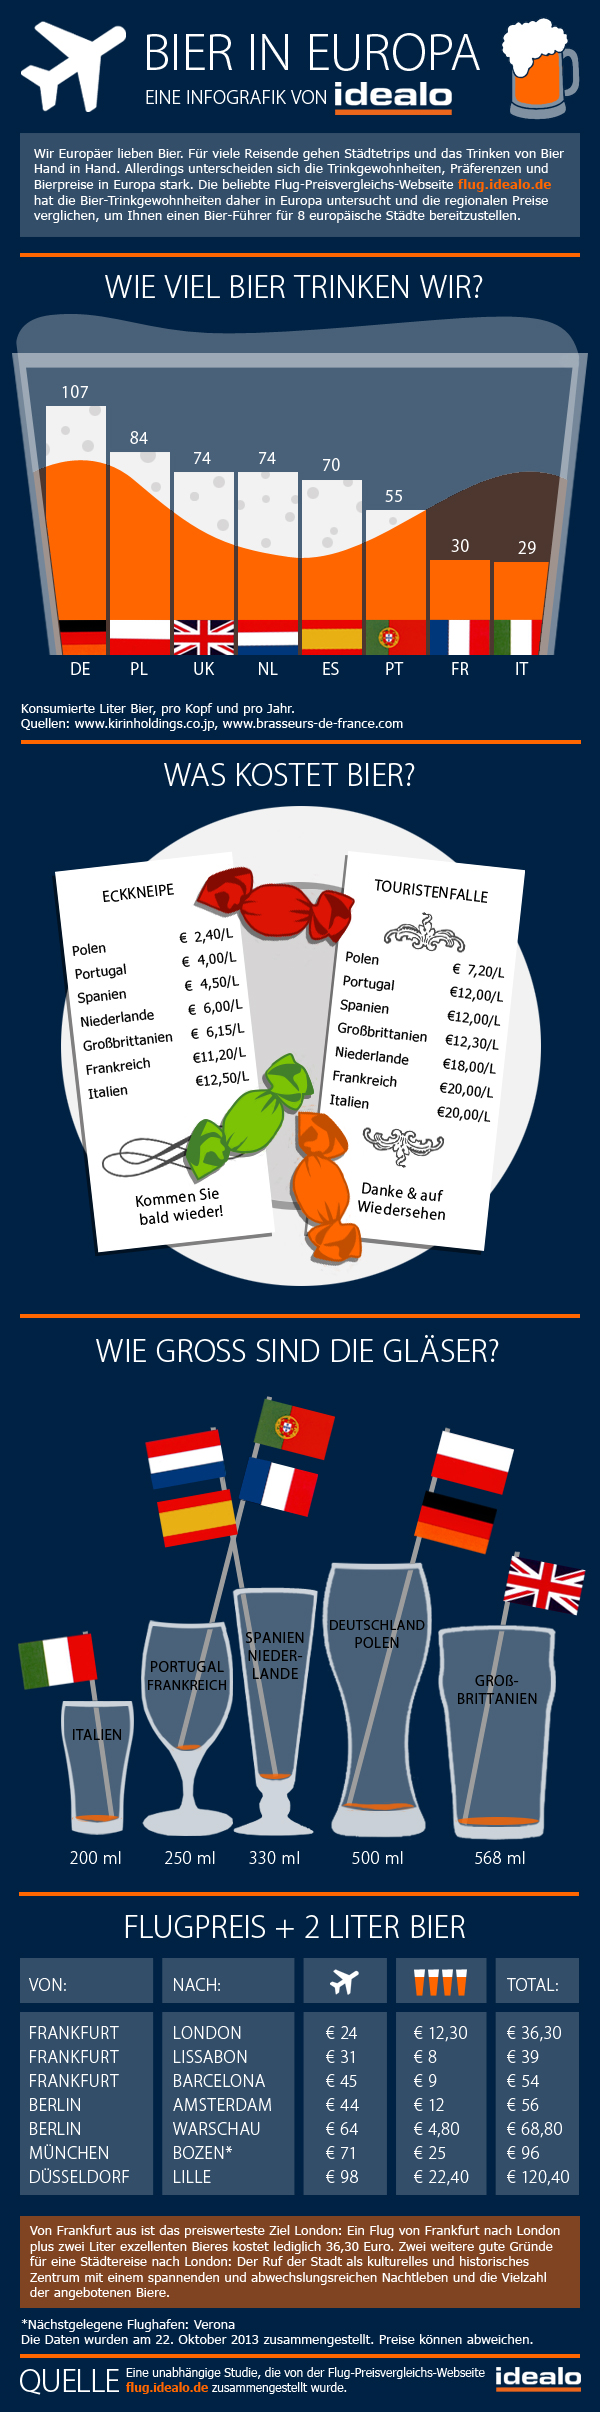 infografik-bier-de